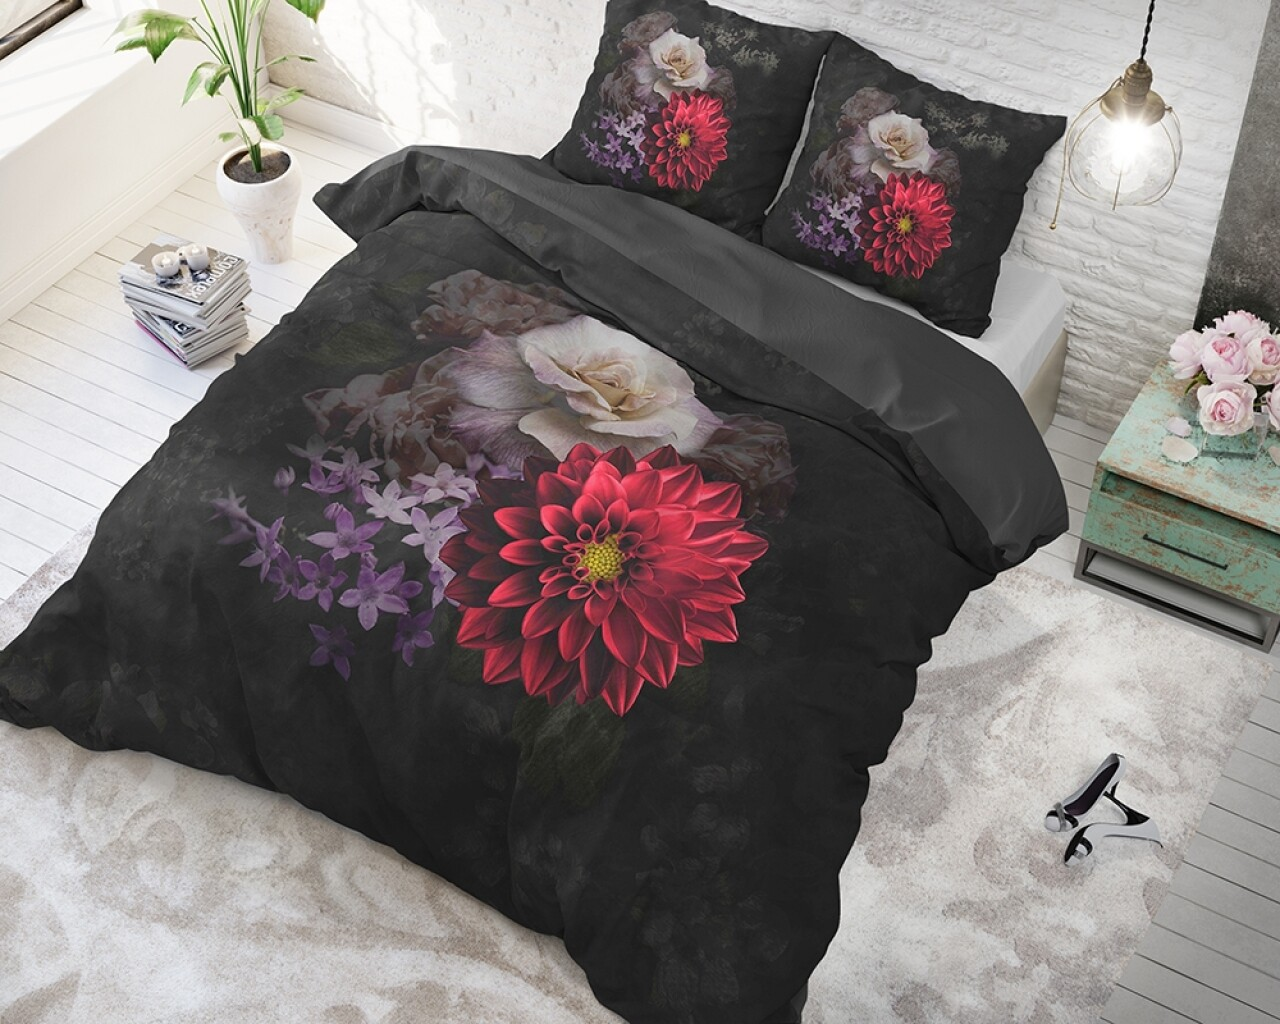 Lenjerie de pat pentru doua persoane Elegant Flower Black, Sleeptime, Cotton Blended